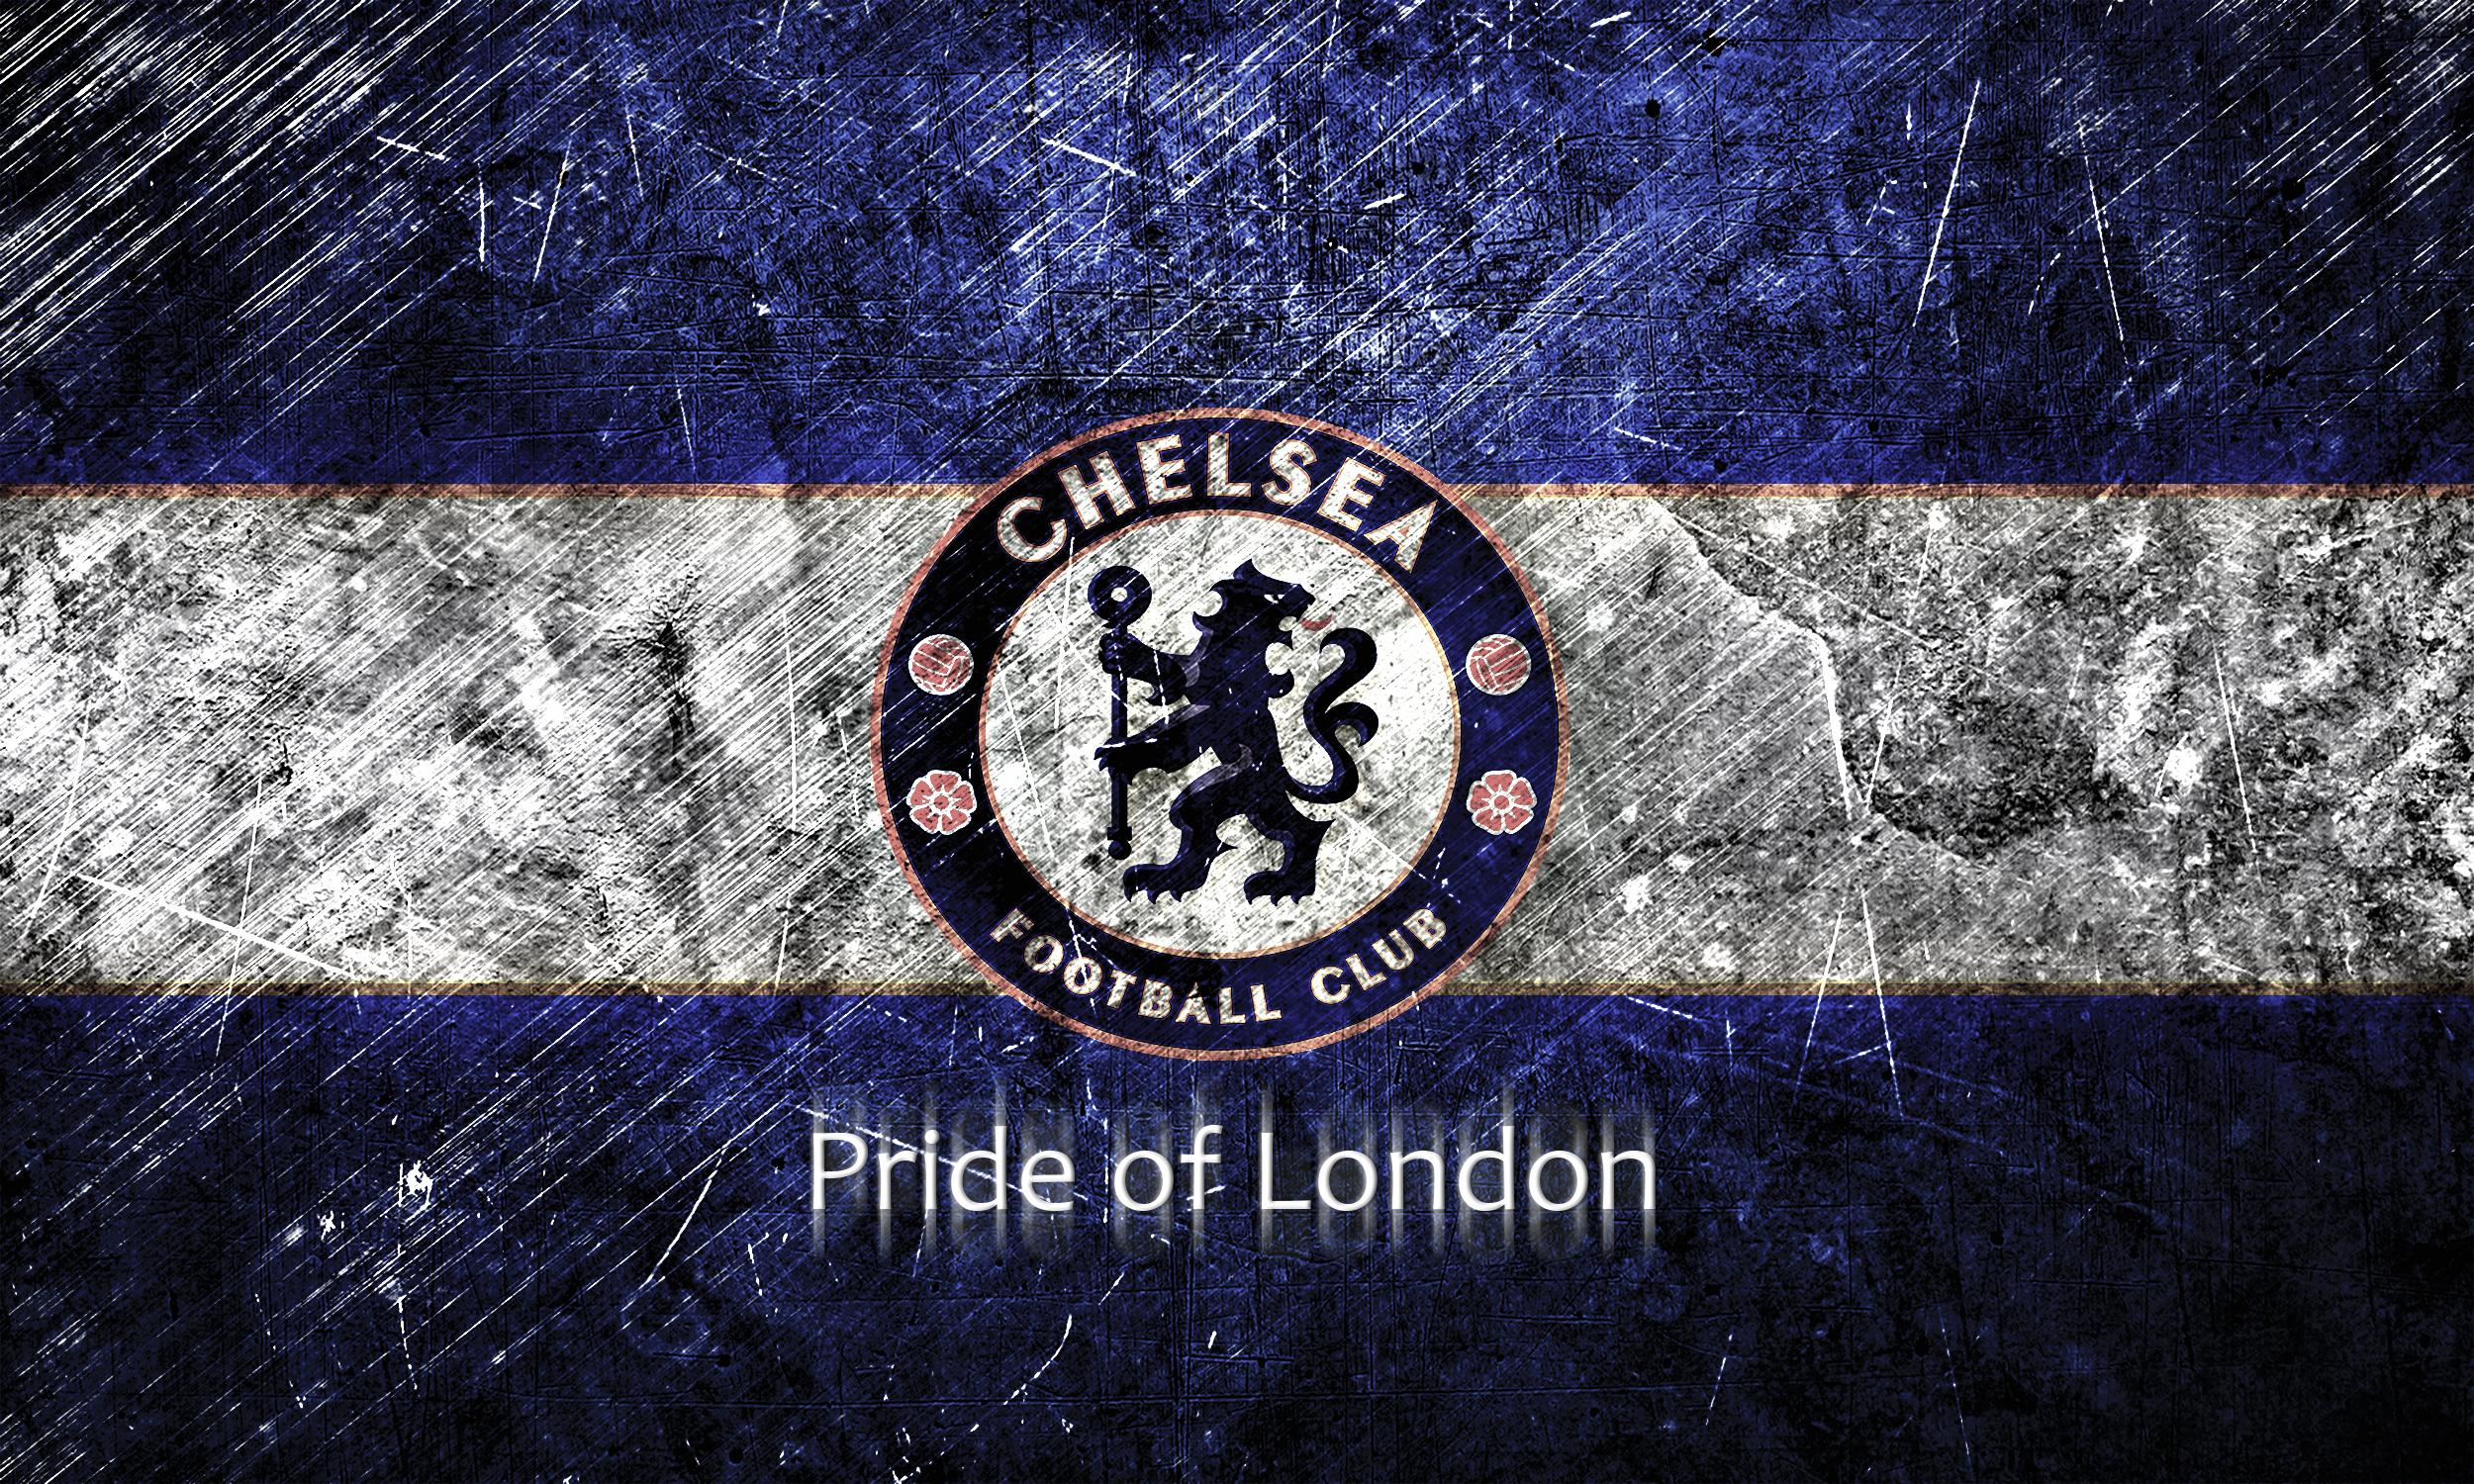 Football Club Chelsea Fc Wallpaper Logo 8623 Wallpaper High 2500x1500